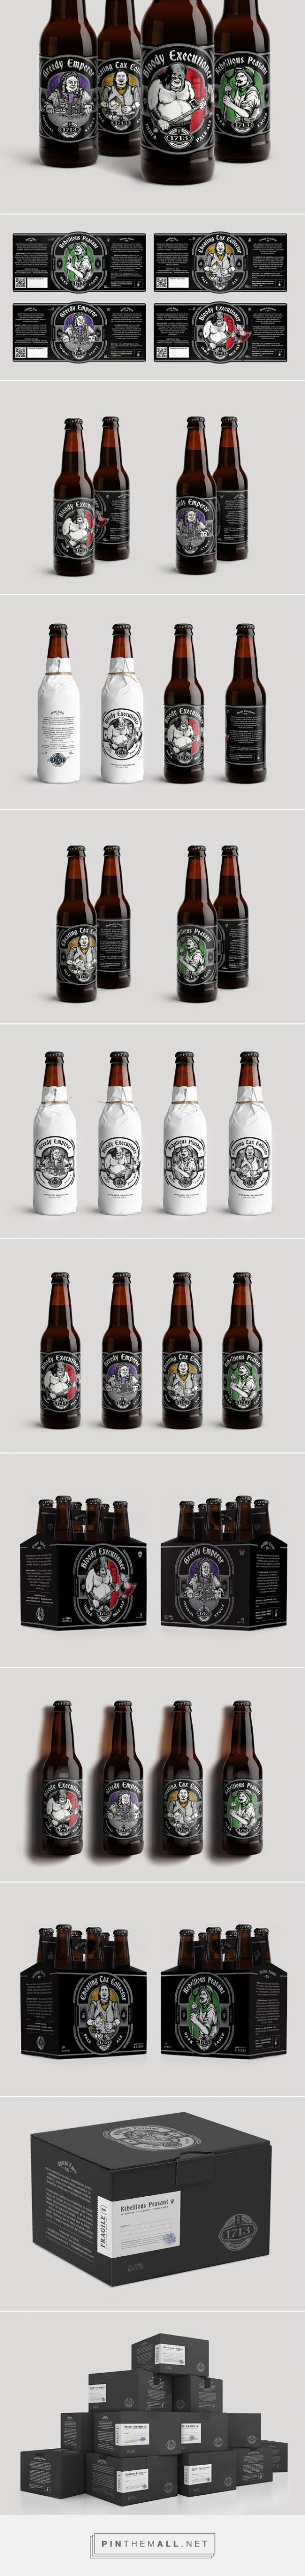 1713 Brewing Co. #beer #packaging designed by Milovanović - http://www.packagingoftheworld.com/2015/06/1713-brewing-co.html